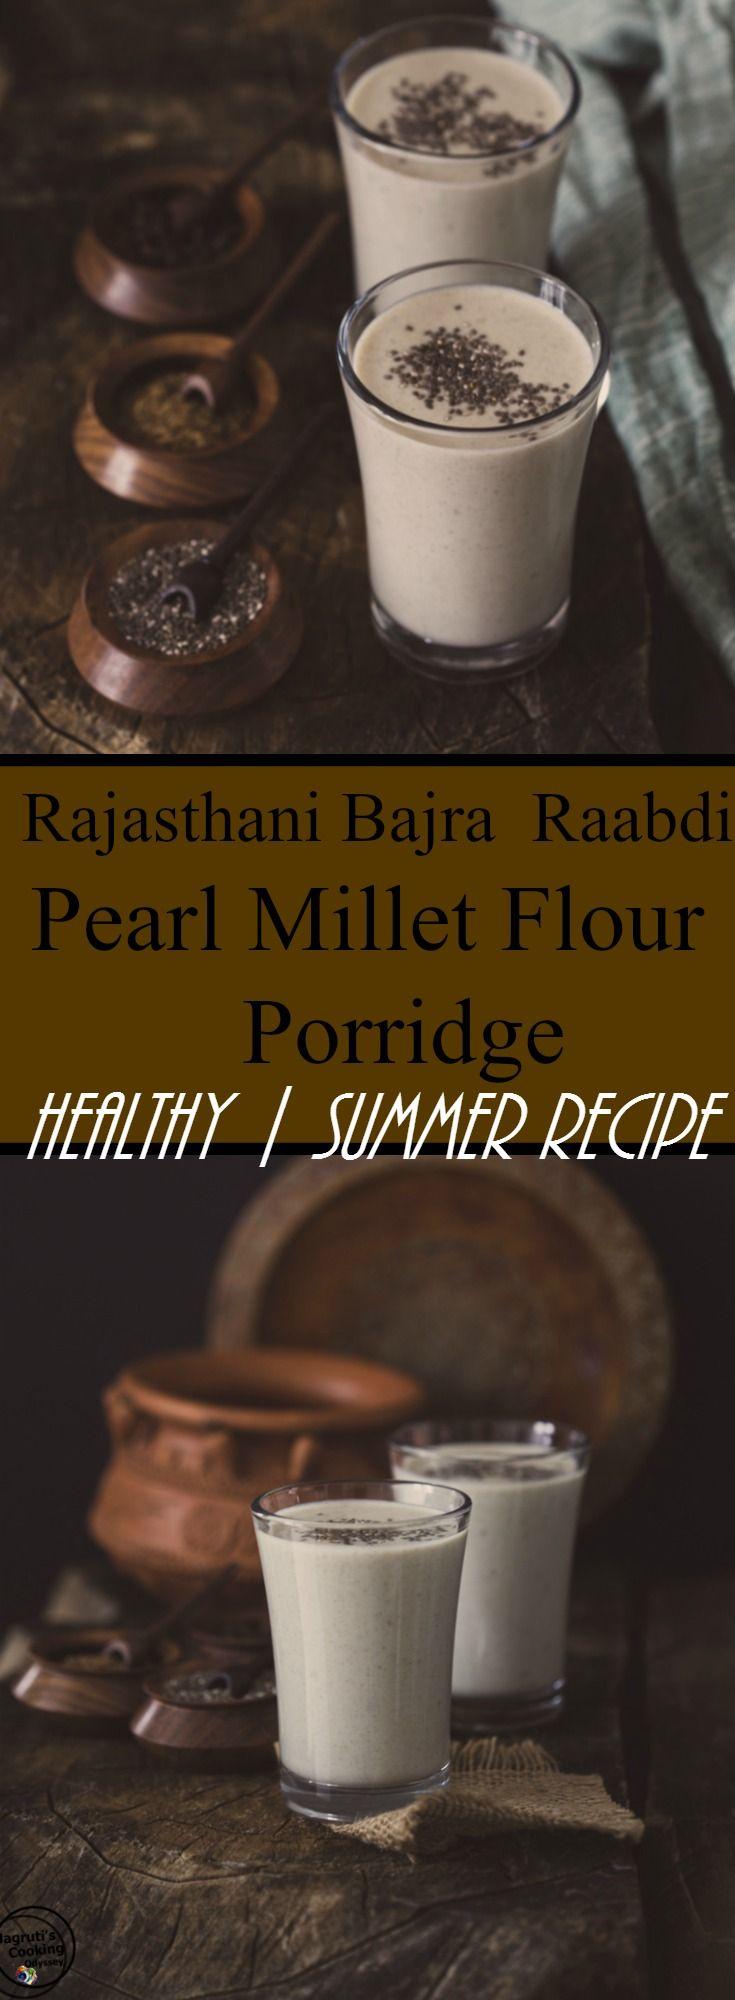 Rajasthani Bajra Raabdi - Pearl Millet Flour Porridge